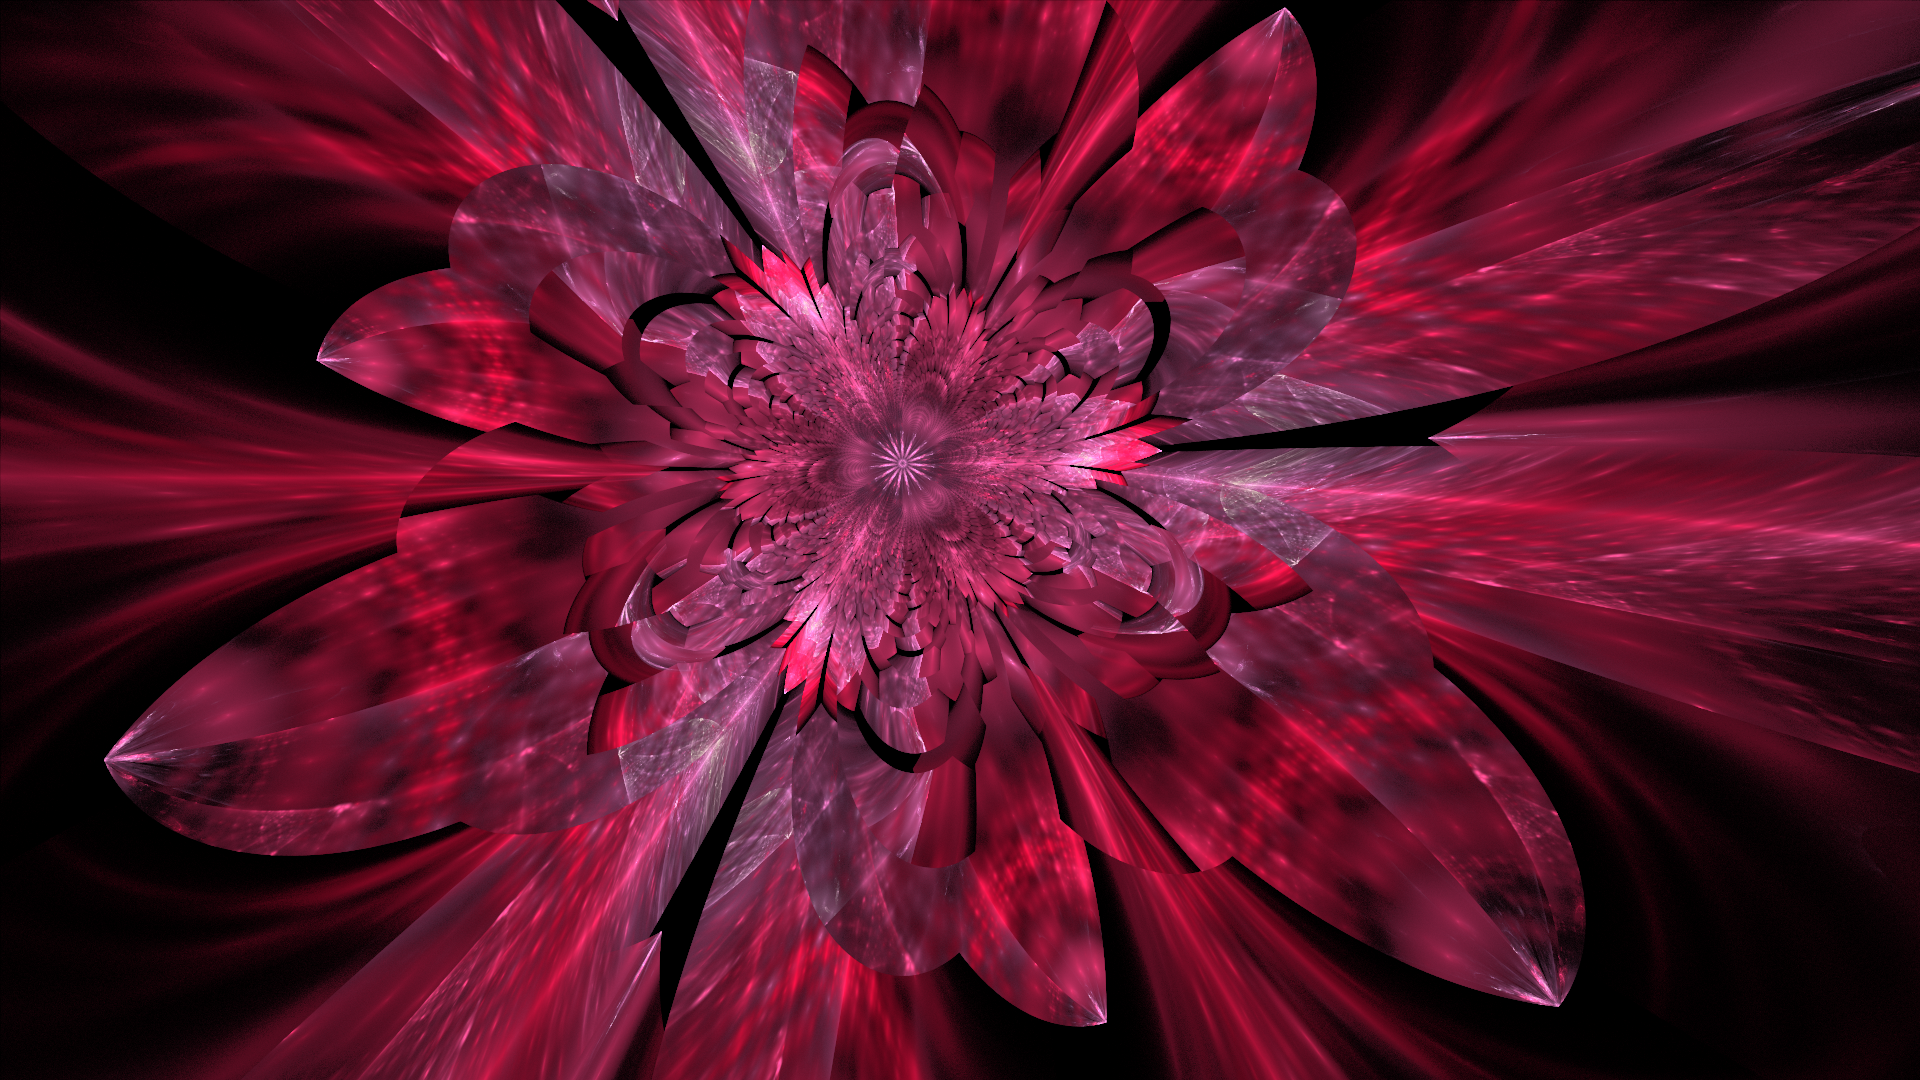 Stone Flower by Fractamonium